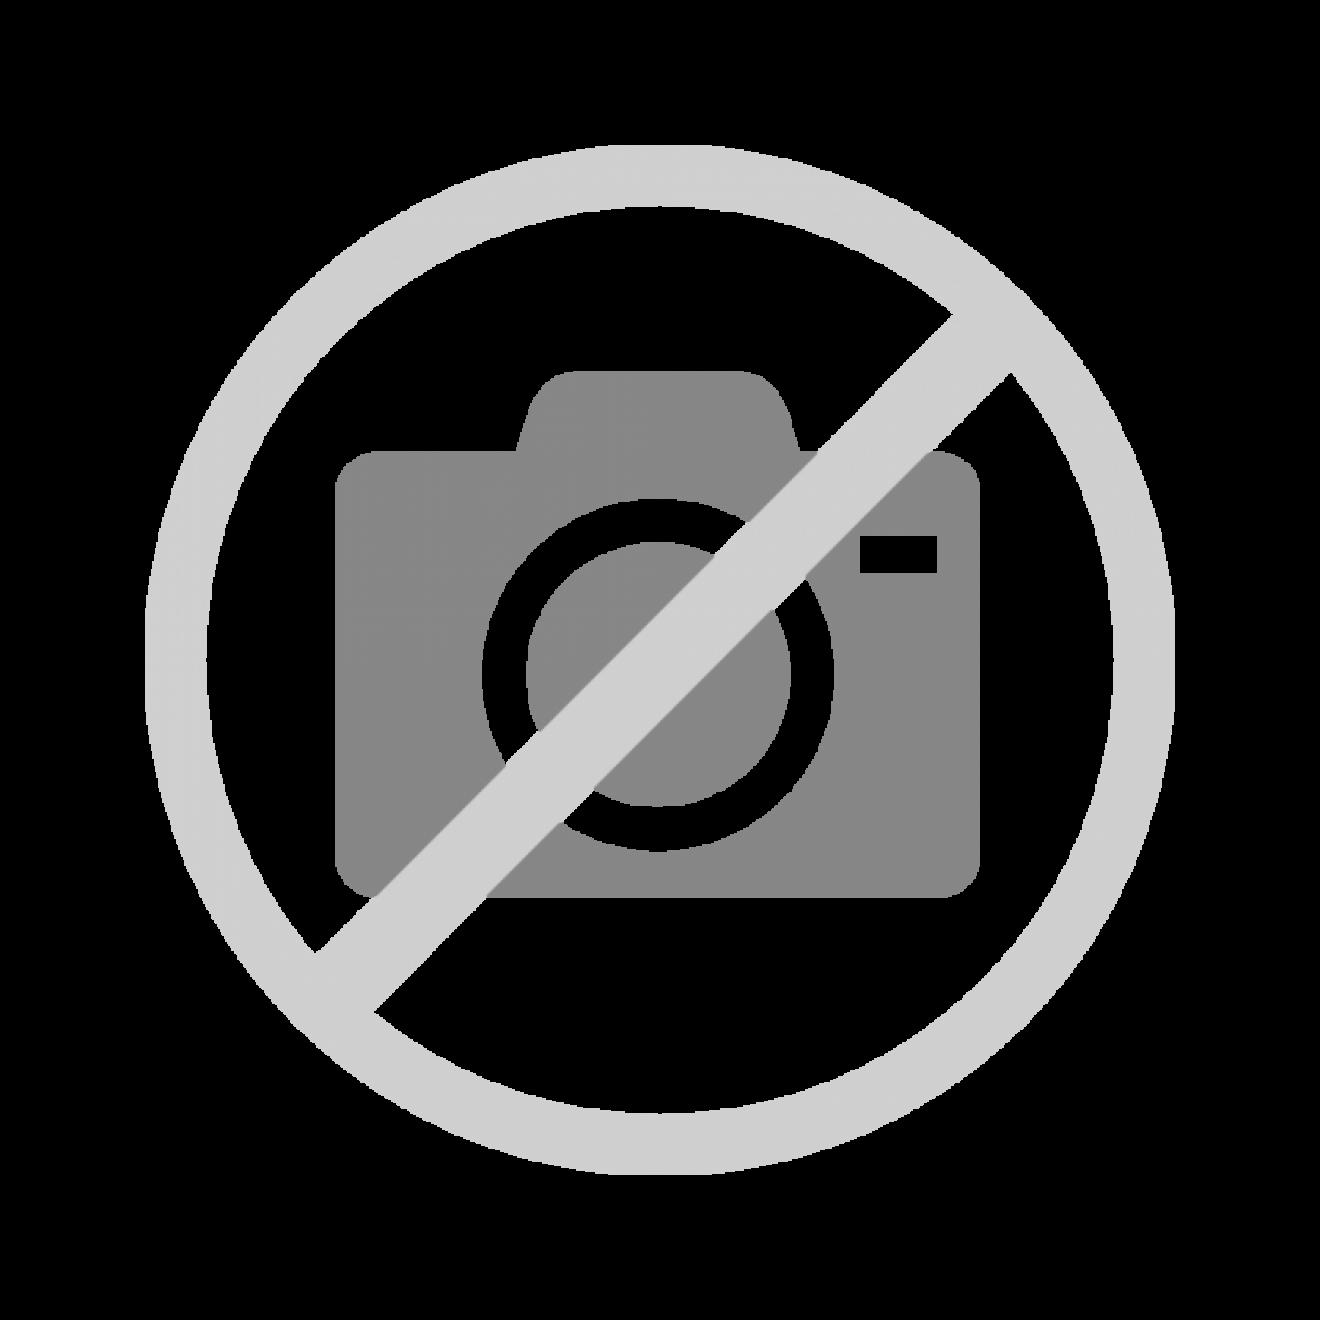 12 sico marathon kondome kondome gleitgel sexspielzeug u v m diskret online kaufen. Black Bedroom Furniture Sets. Home Design Ideas